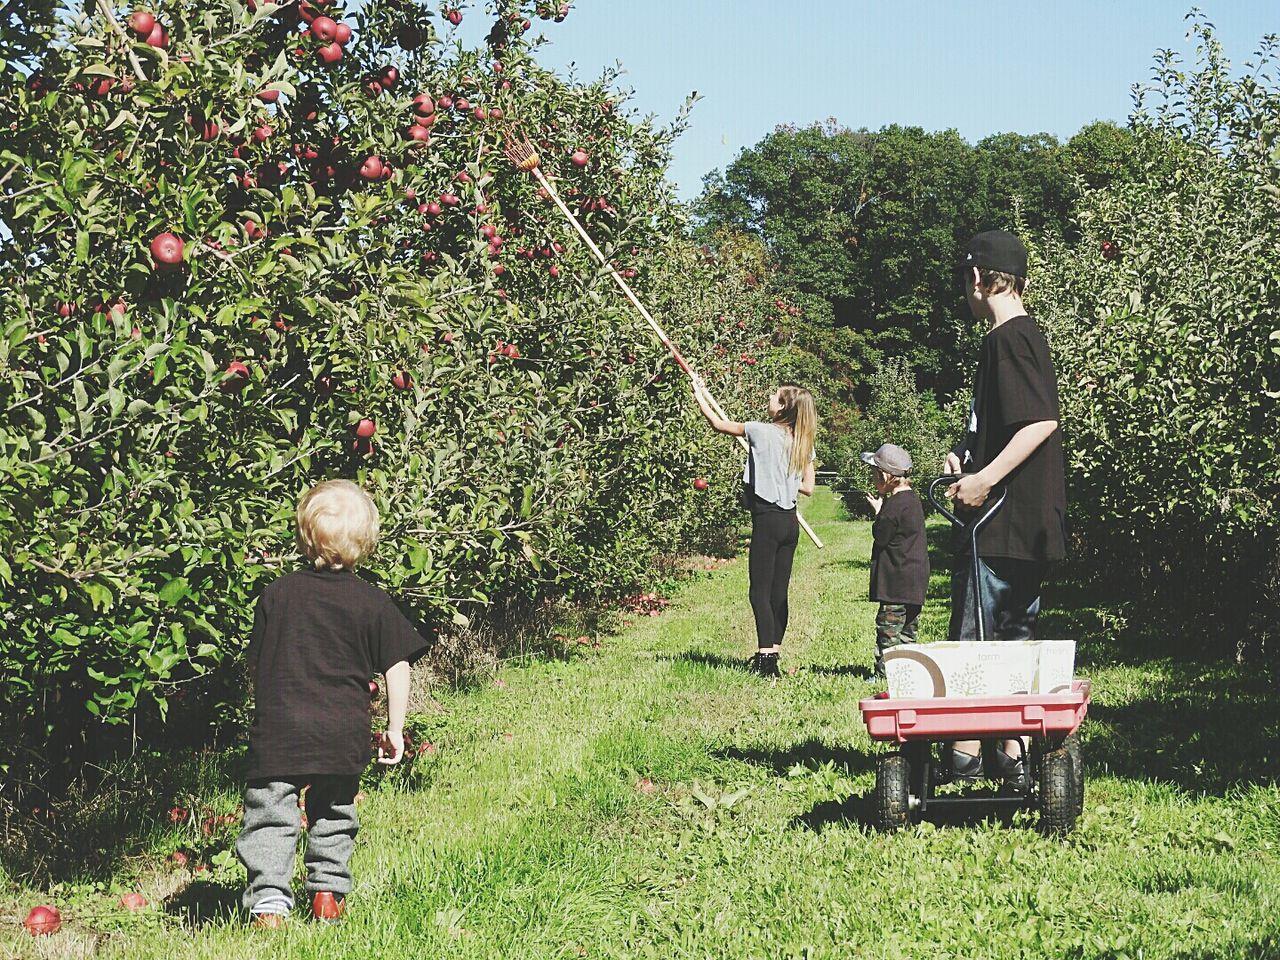 Beautiful stock photos of apple, 10-11 Years, 14-15 Years, 2-3 Years, 4-5 Years